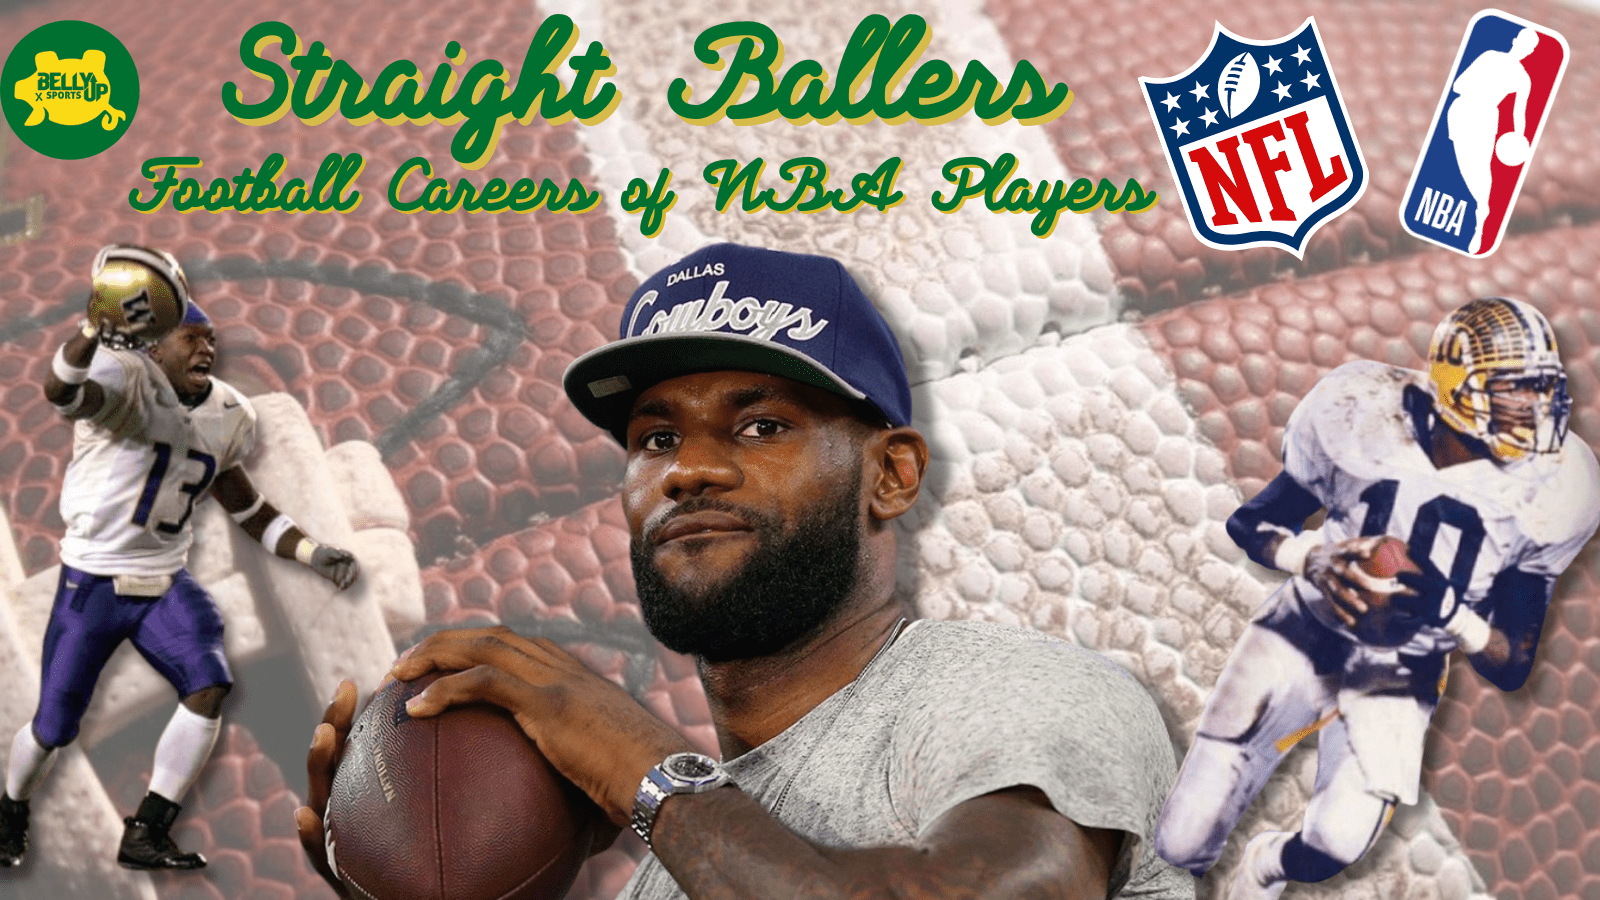 Straight Ballers: Football Careers of NBA Players